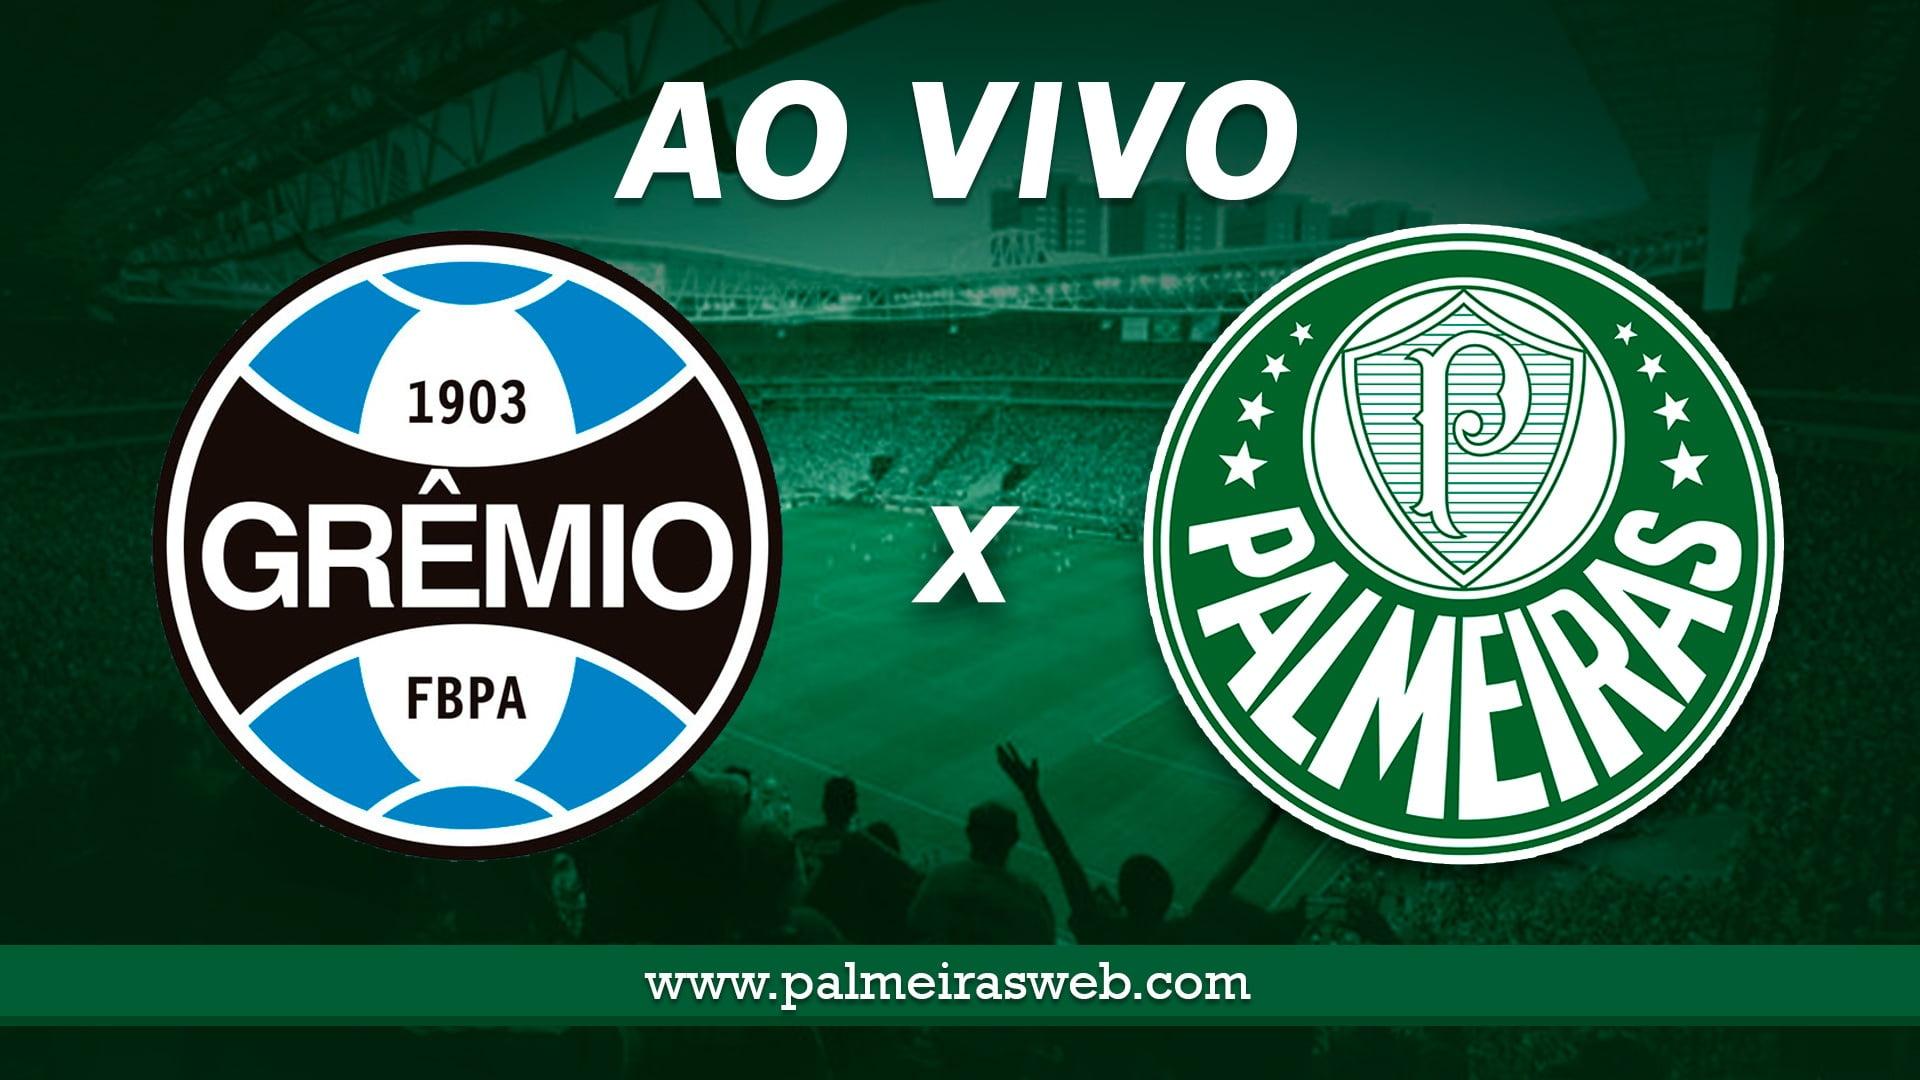 Grêmio x Palmeiras Ao Vivo